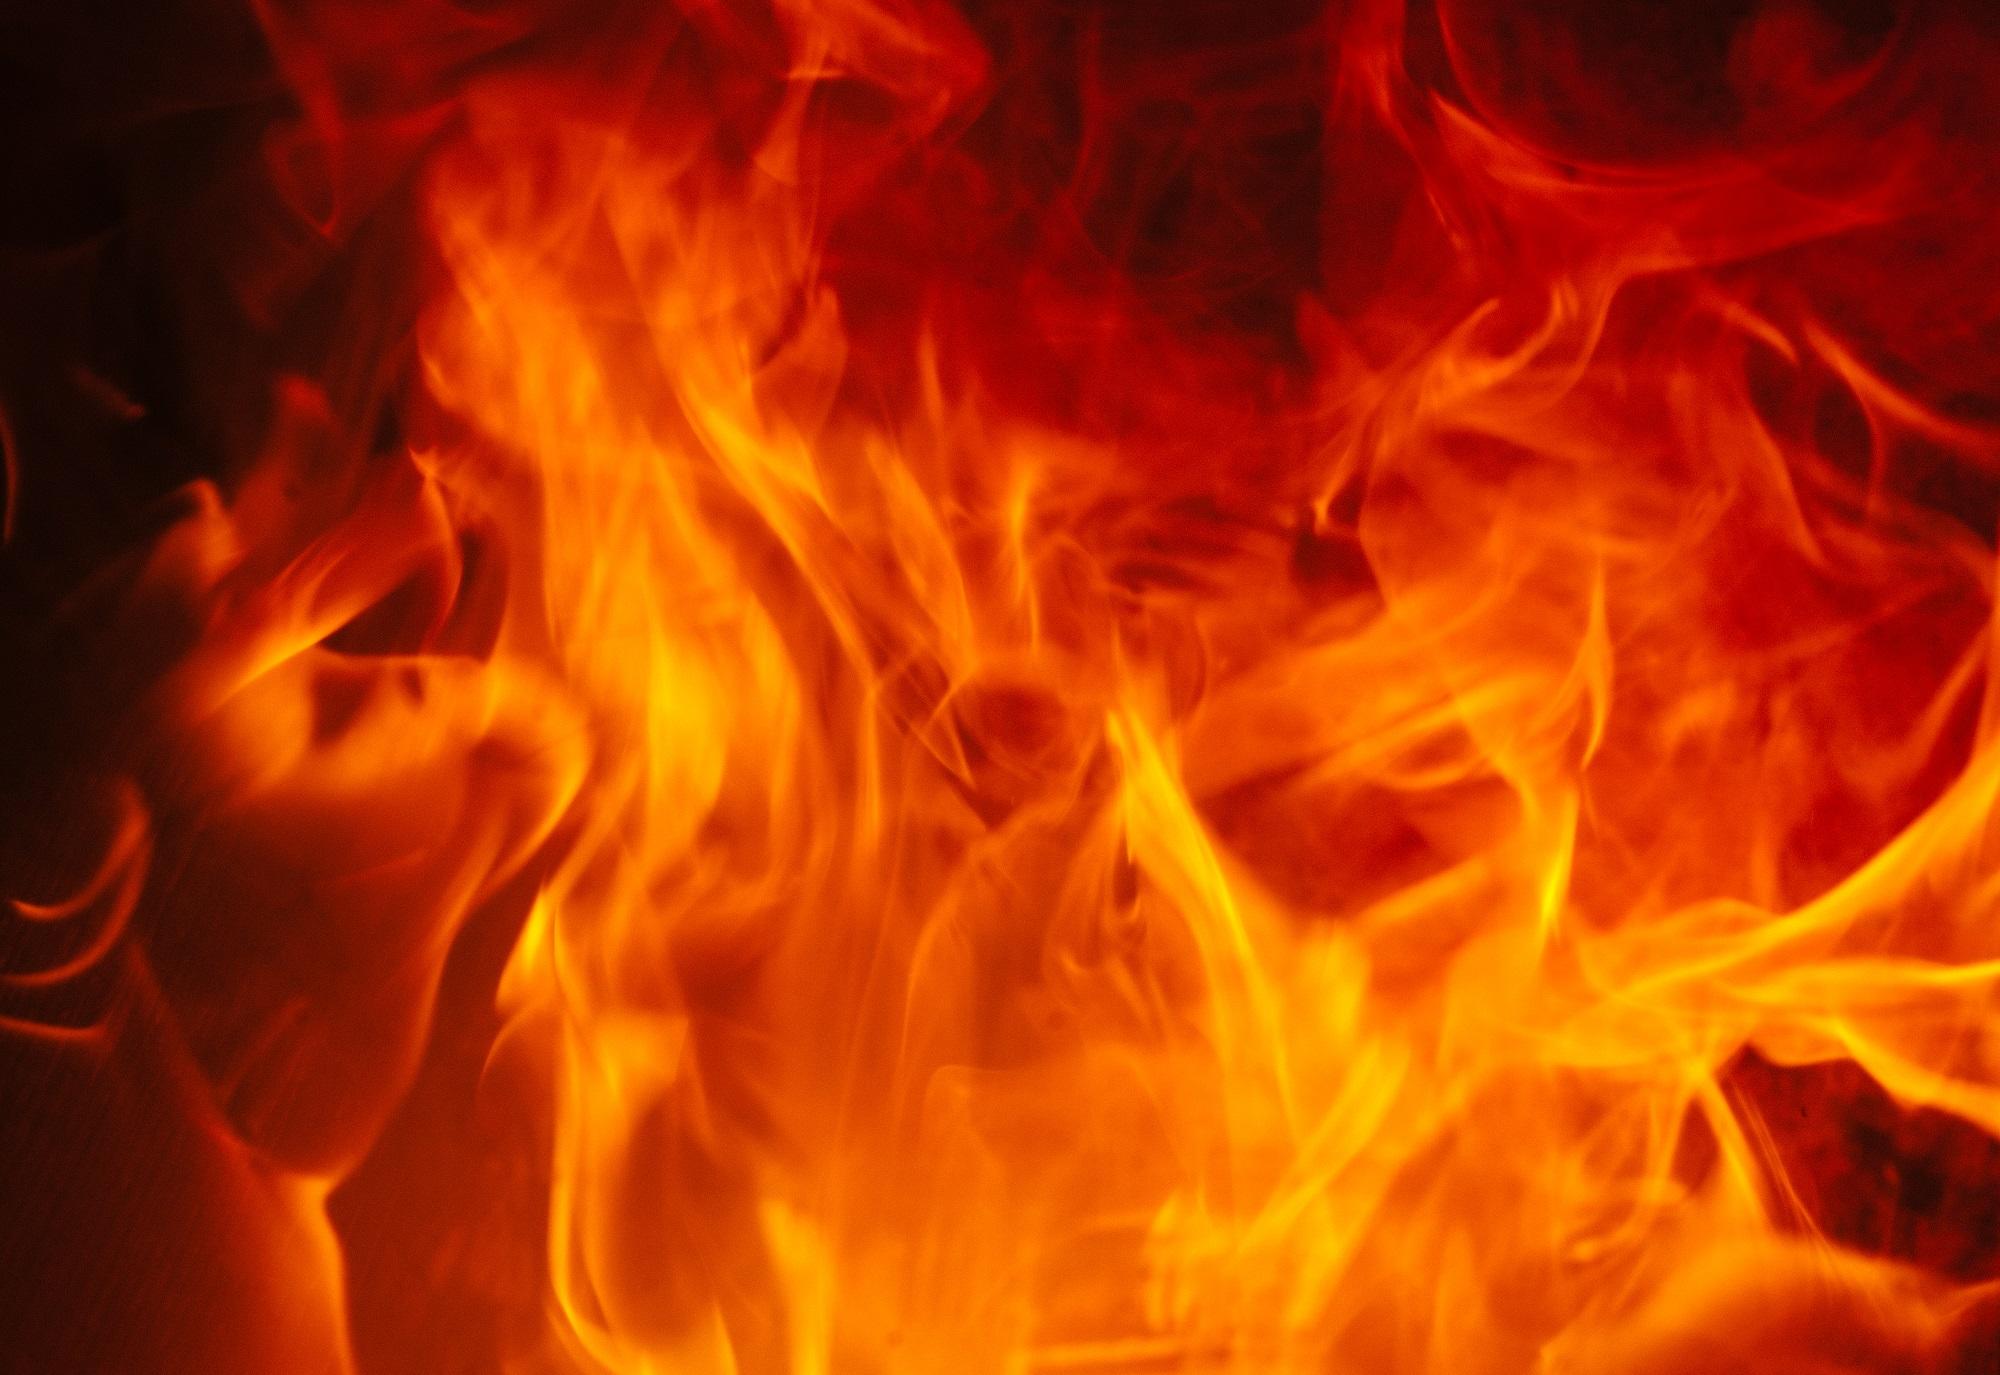 Fire-orange-emergency-burning_-_copy_0